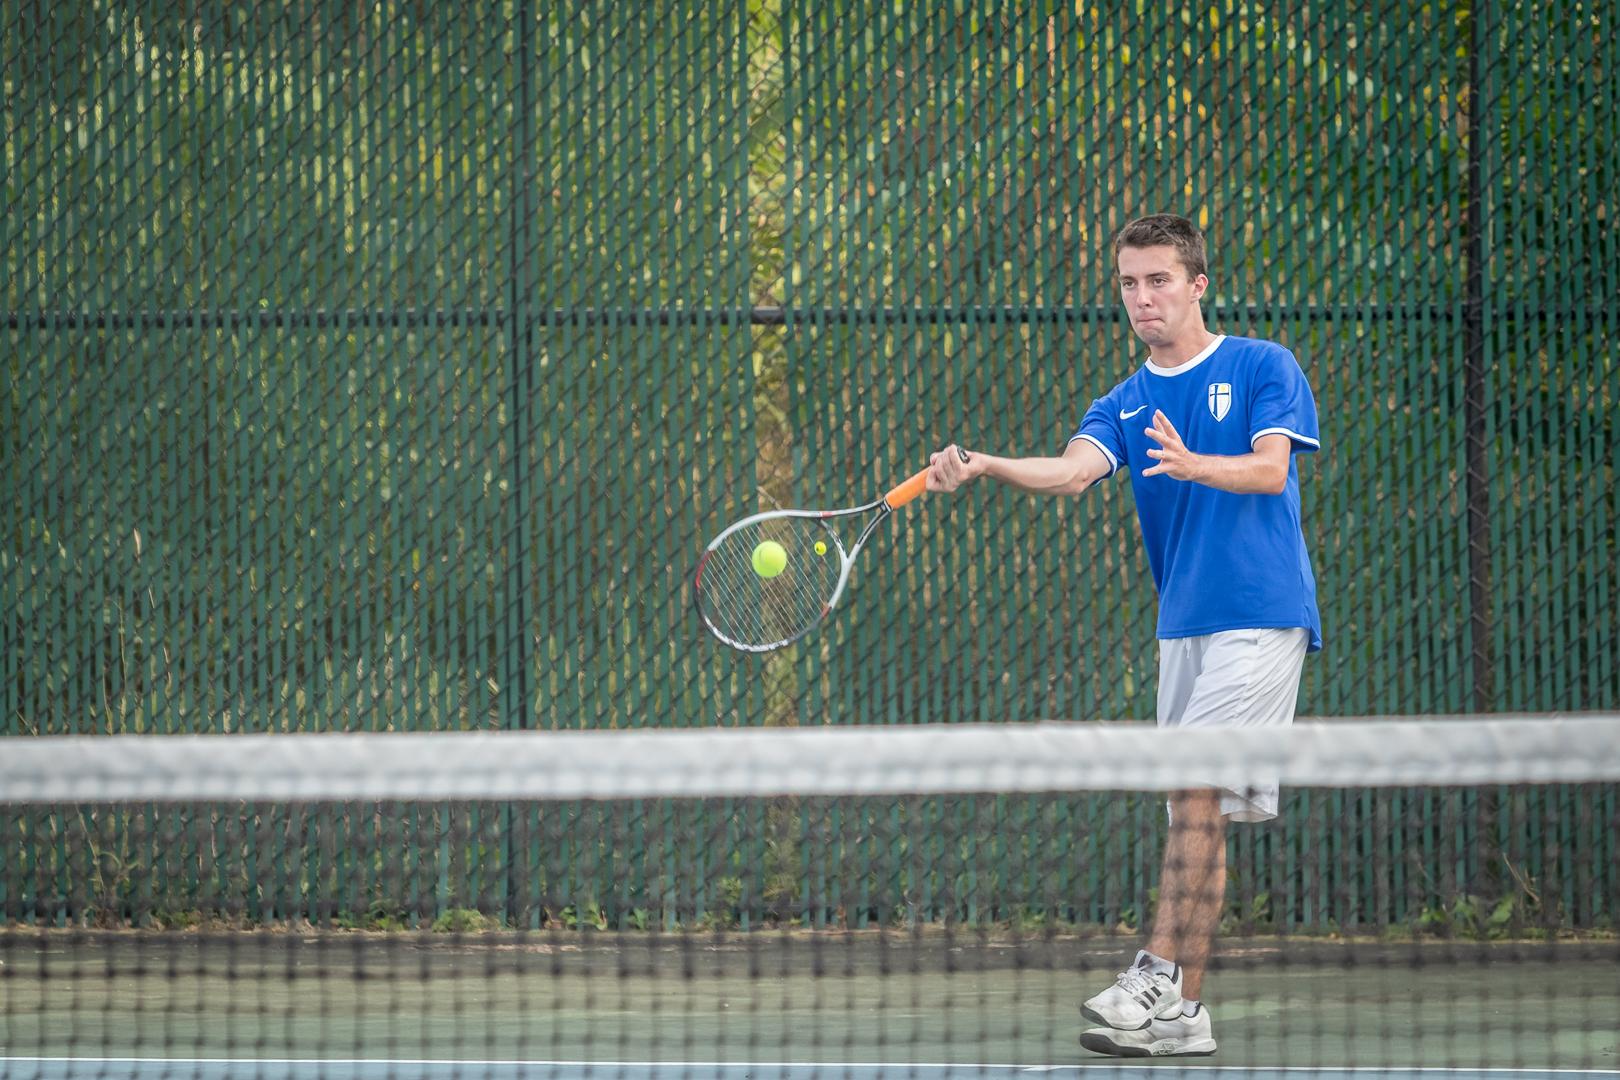 Marian-Boys-Tennis-1710.jpg